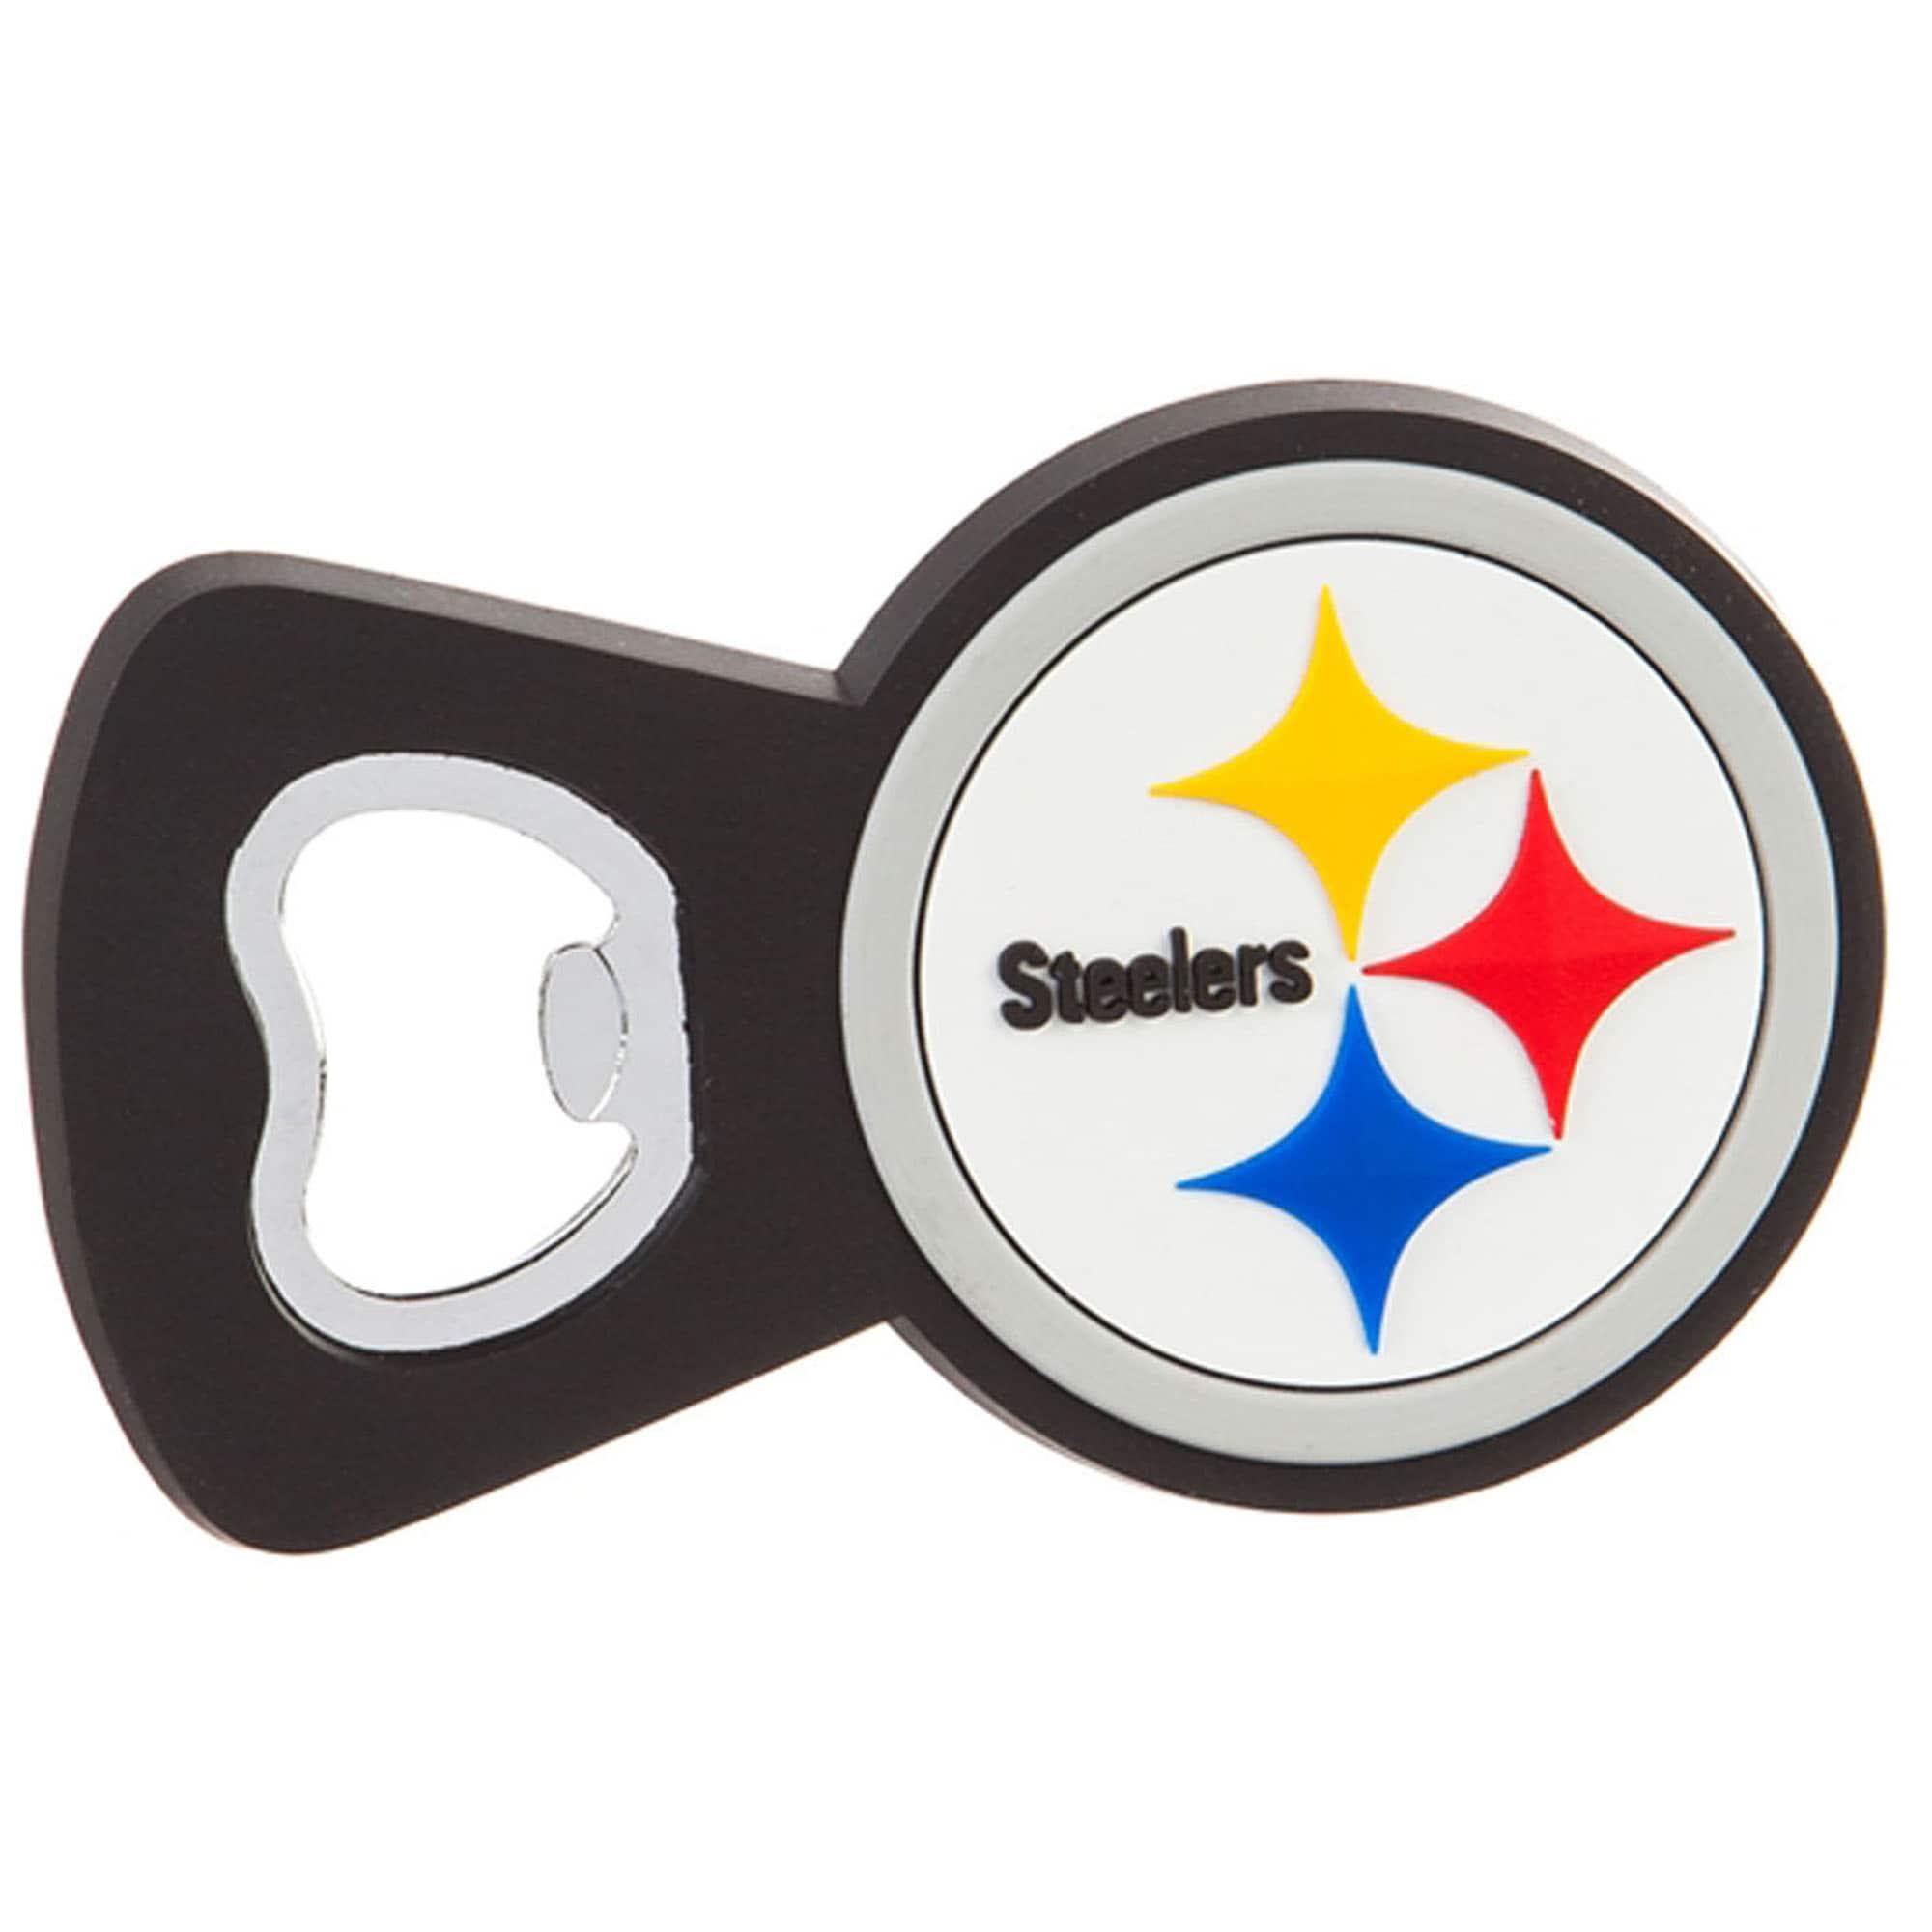 Pittsburgh Steelers Team Magnet Bottle Opener